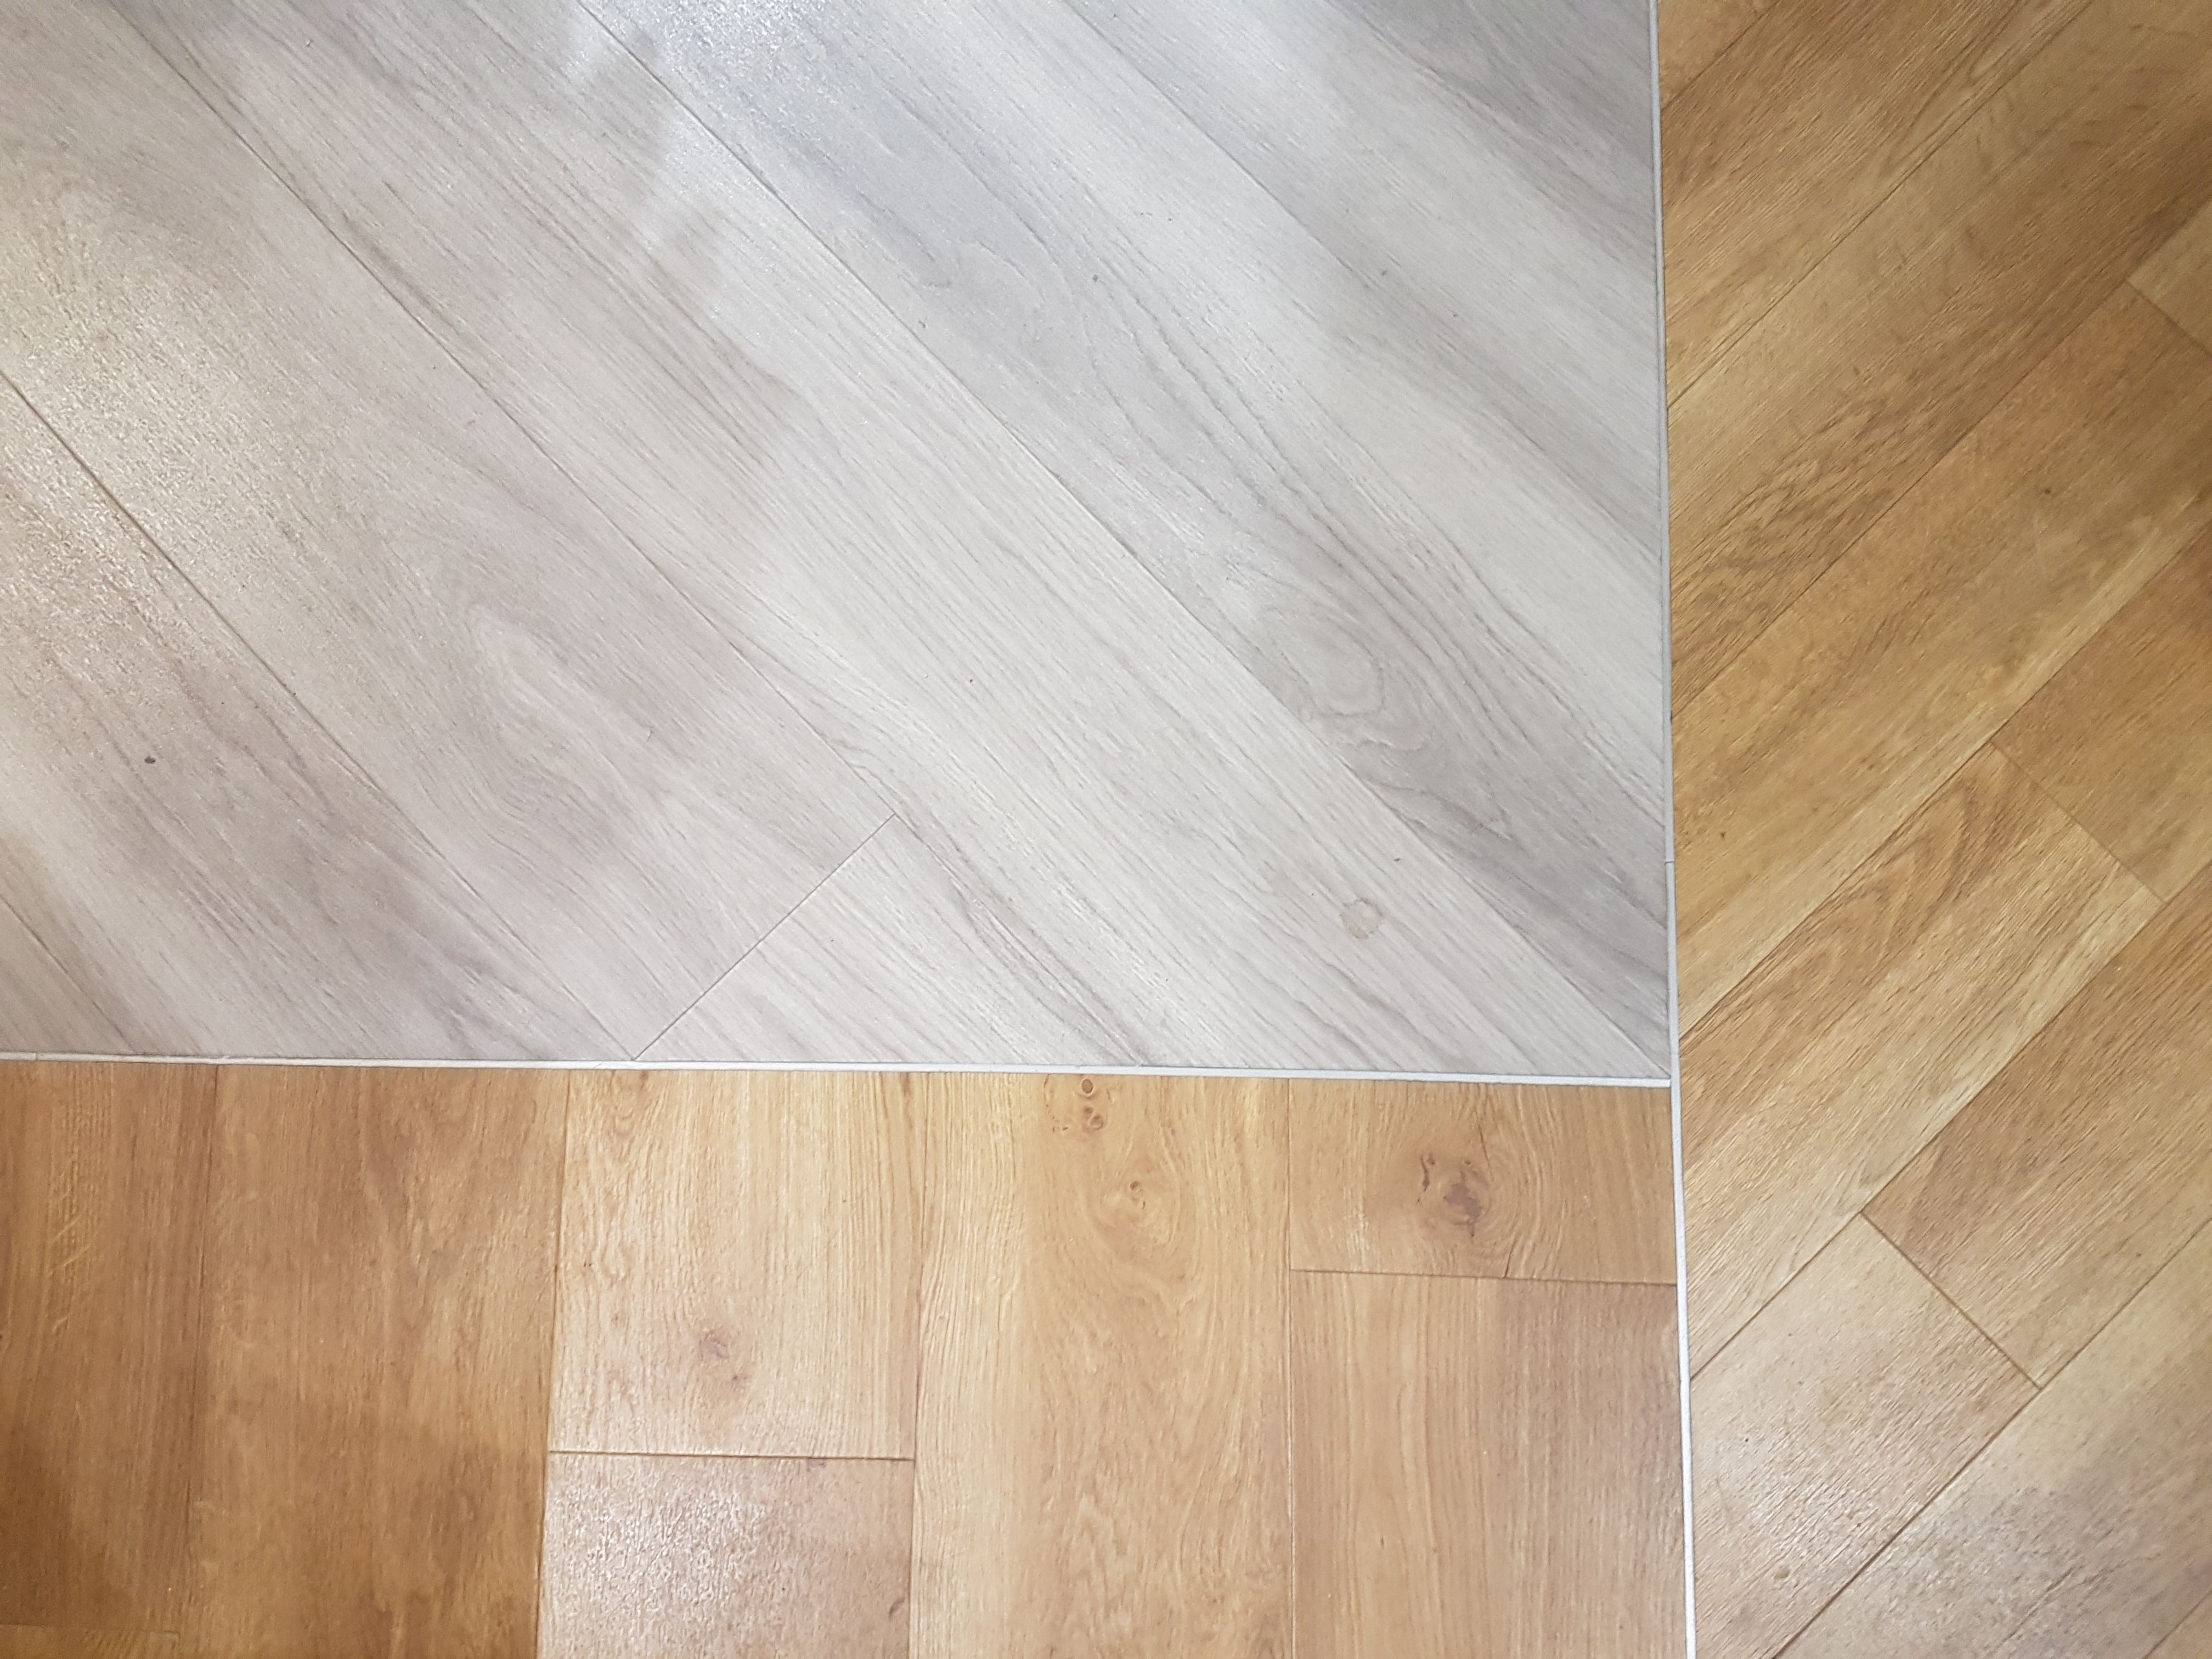 Our Showroom Floors Showcasing Top Left Corner: Amtico Spacia Nordic Oak XL  Bottom Left:: Amtico Spacia Traditional Oak XL Right: Amtico Signature  American ...